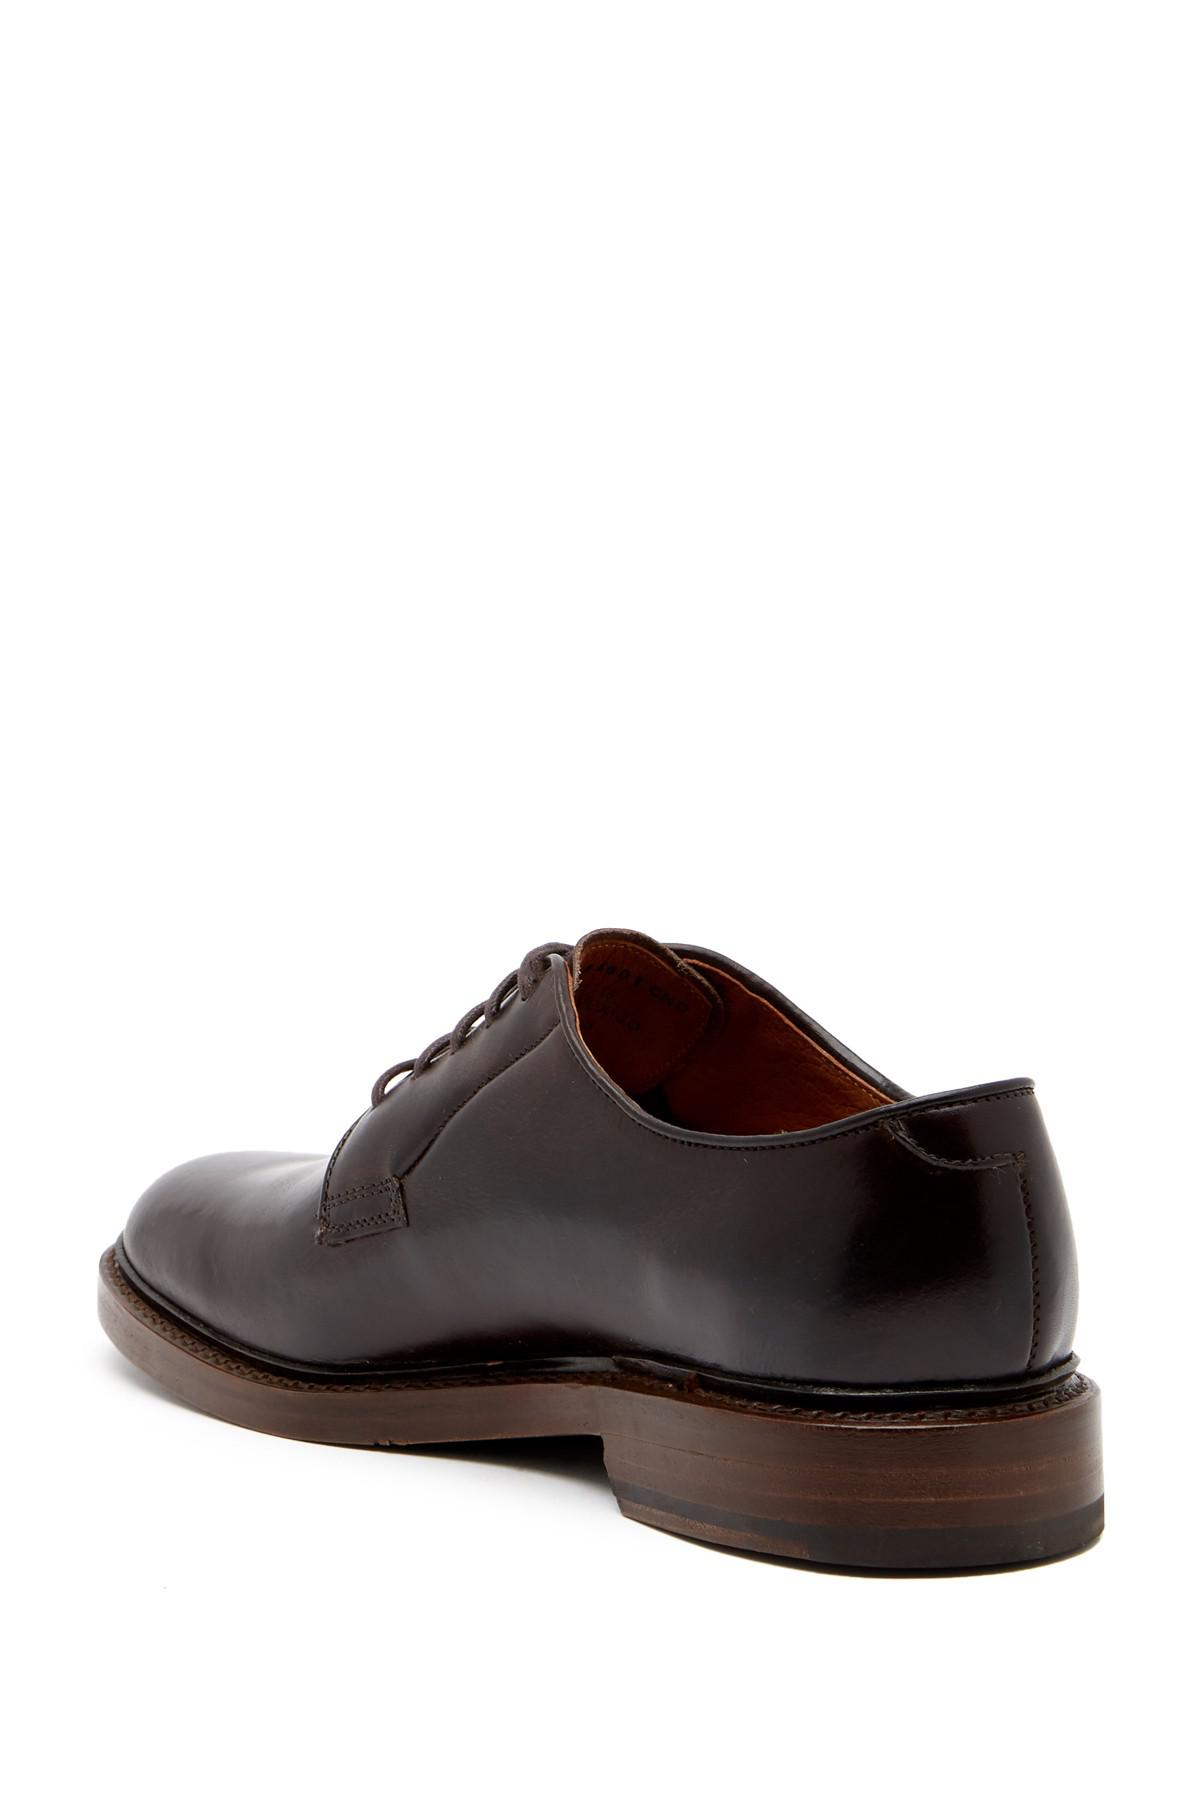 Frye Jones Plain Toe Oxford QVG0Gizz